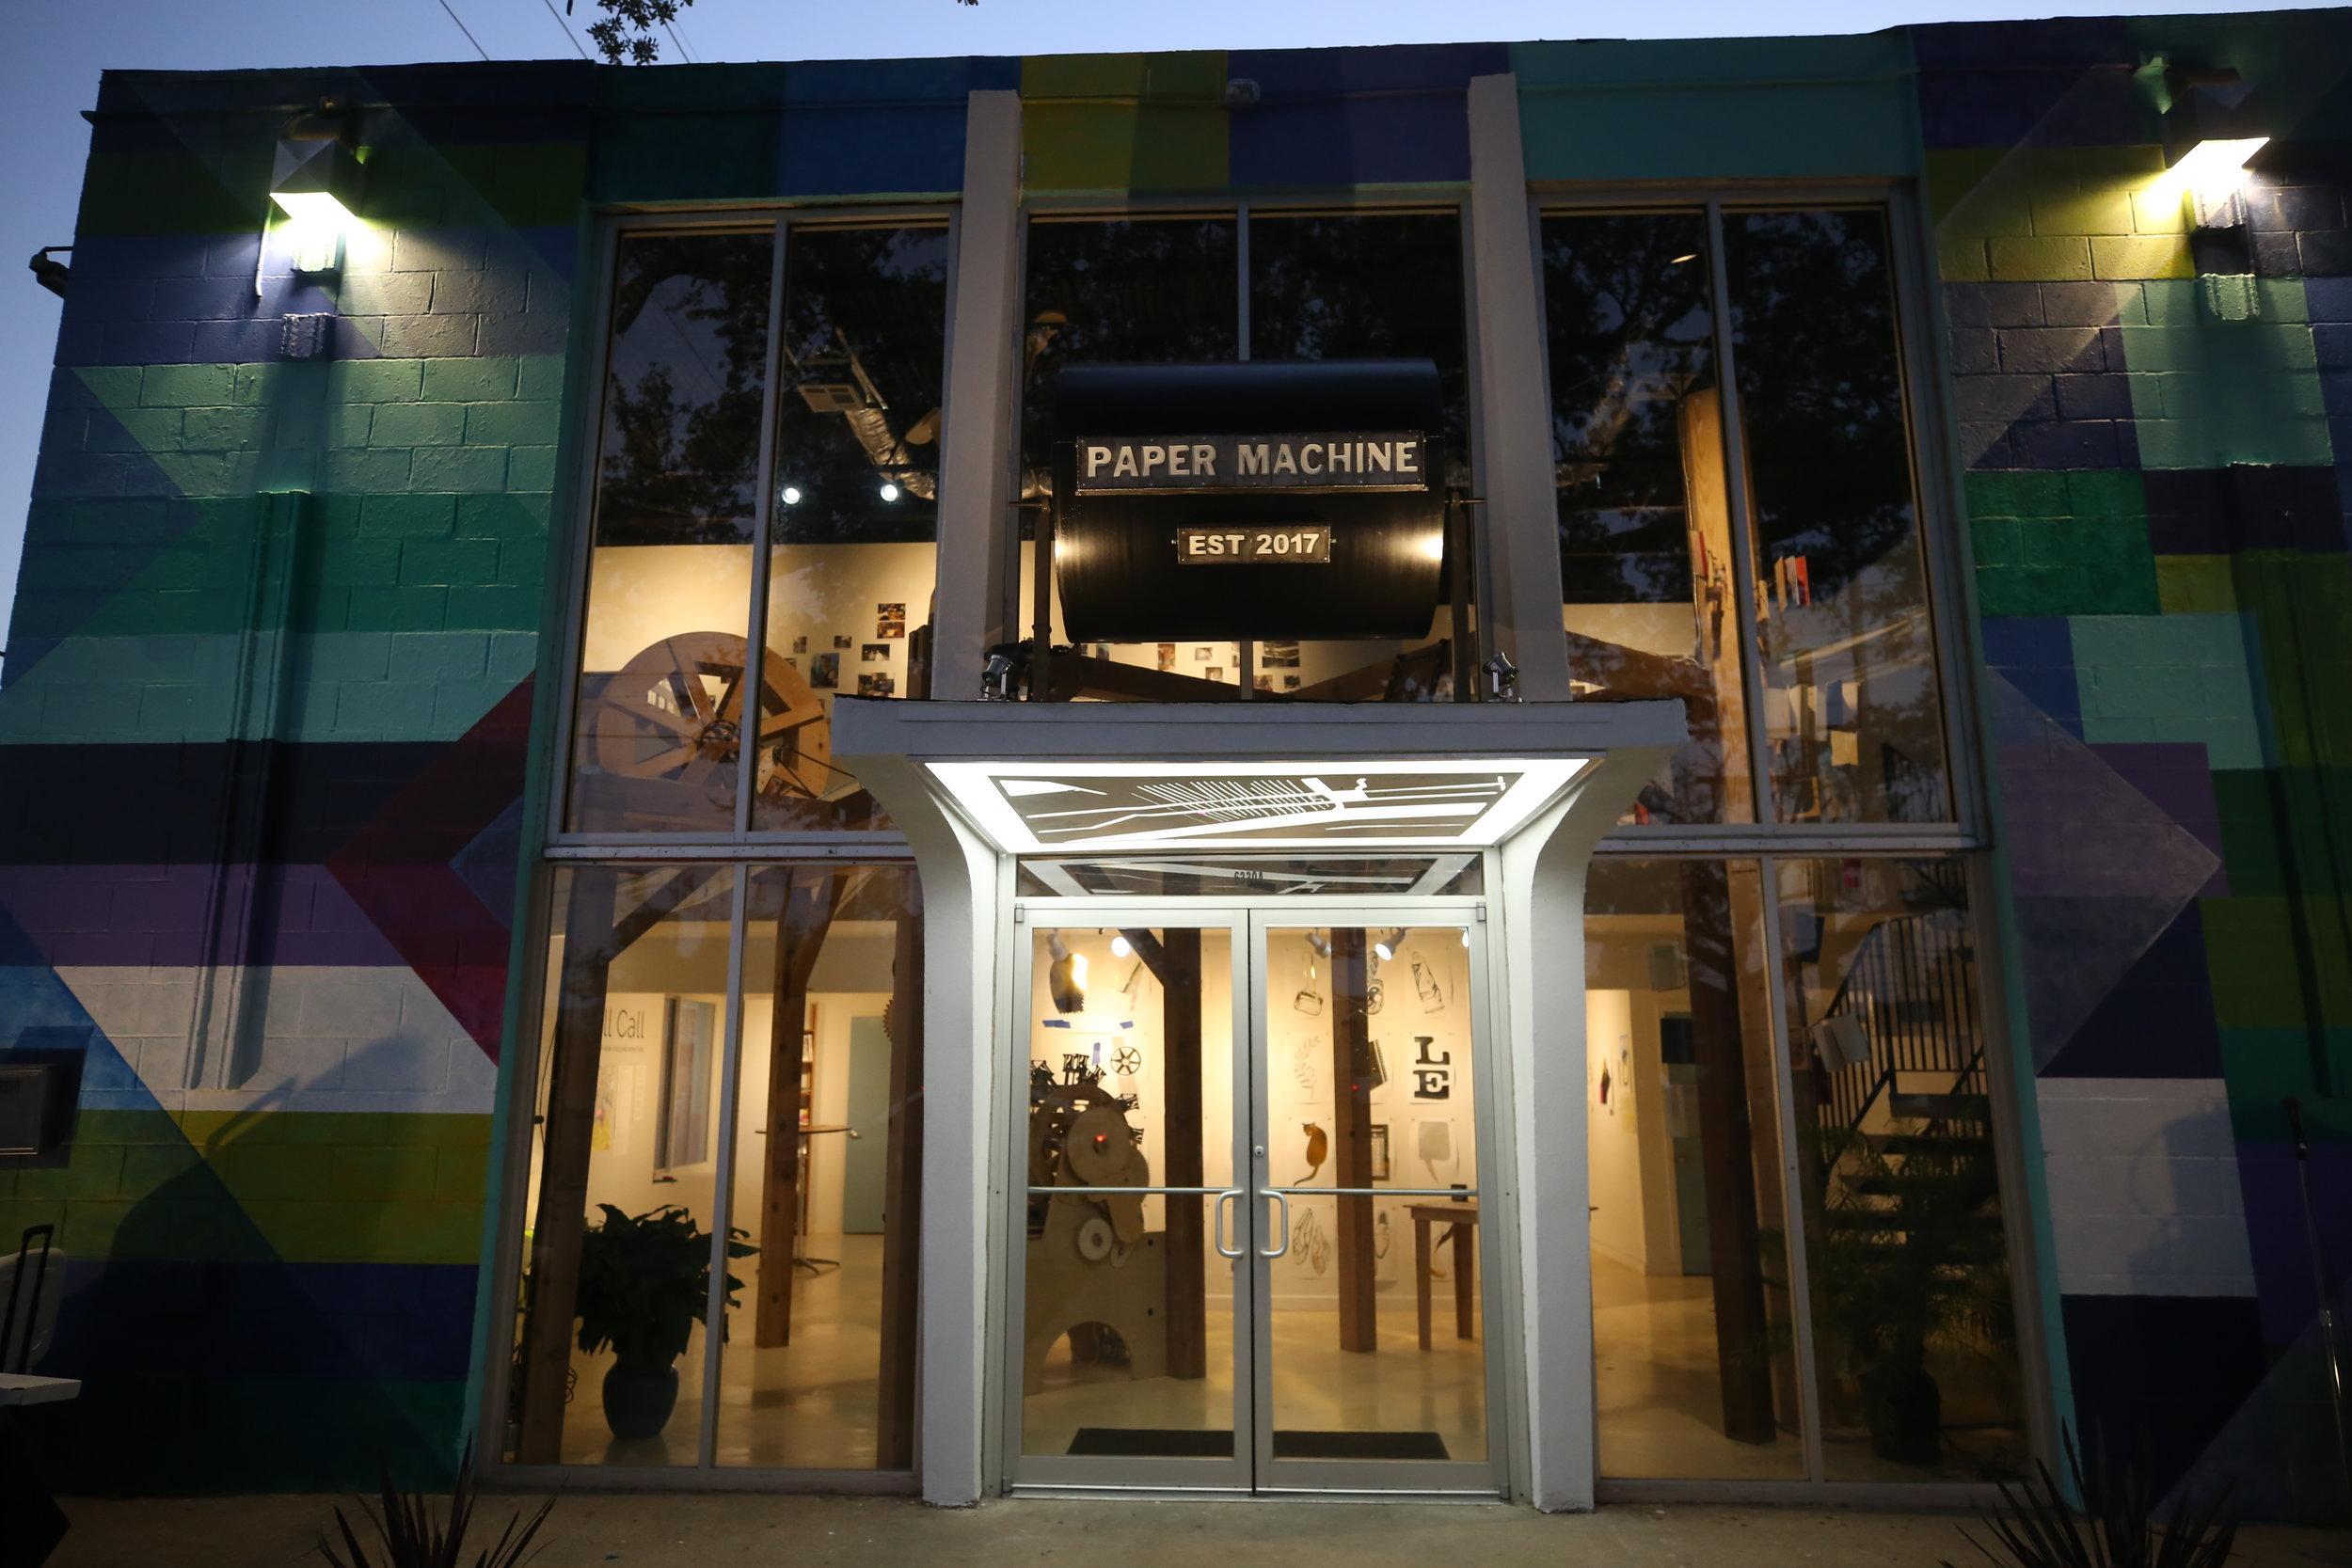 11-28-2017 Opening of Paper Machine 076.jpeg